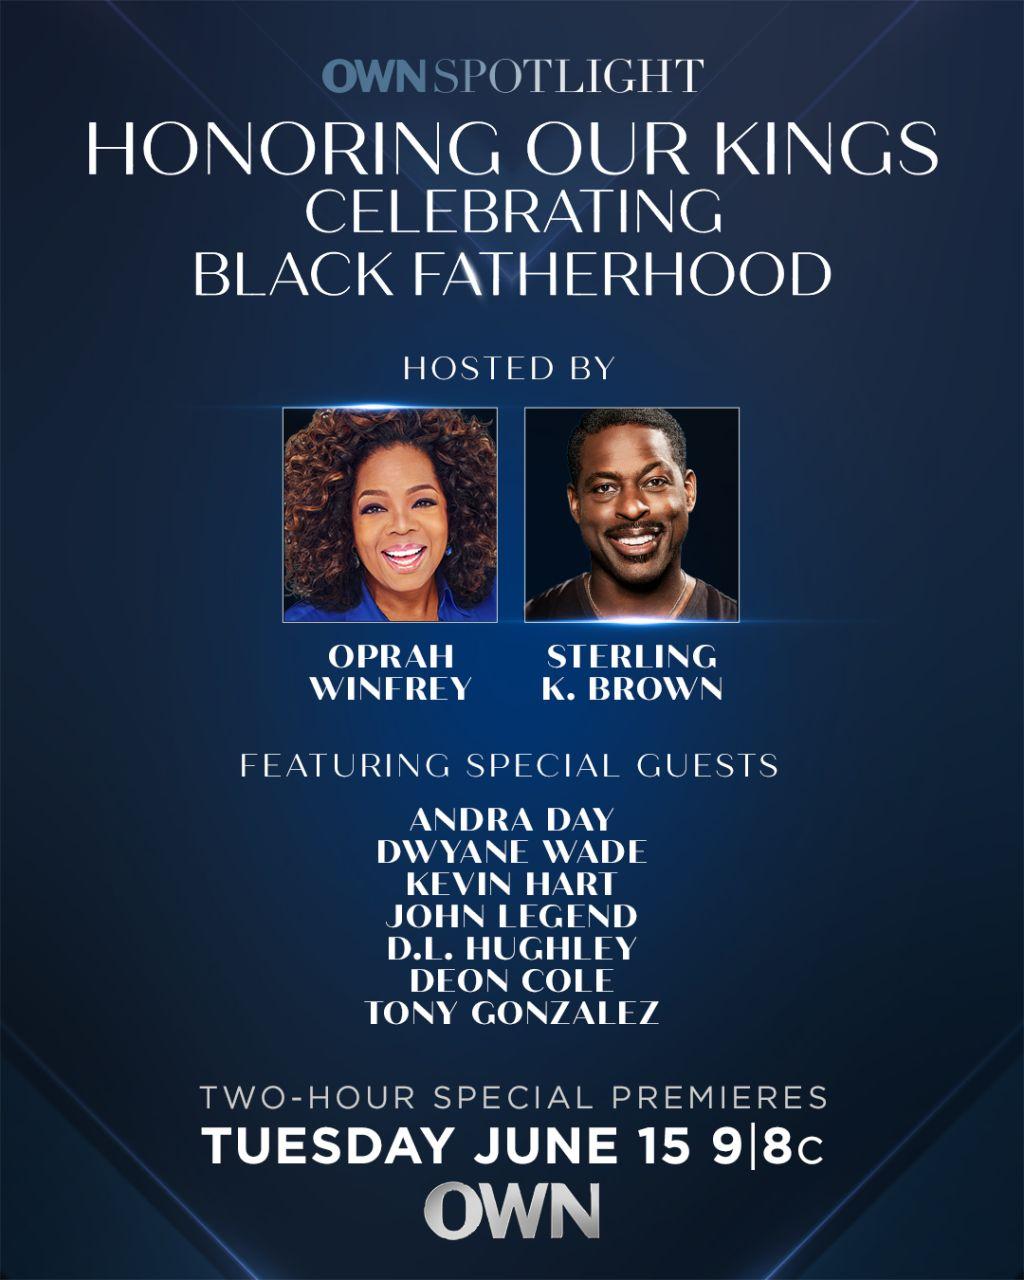 Honoring our kings celebrating black fatherhood